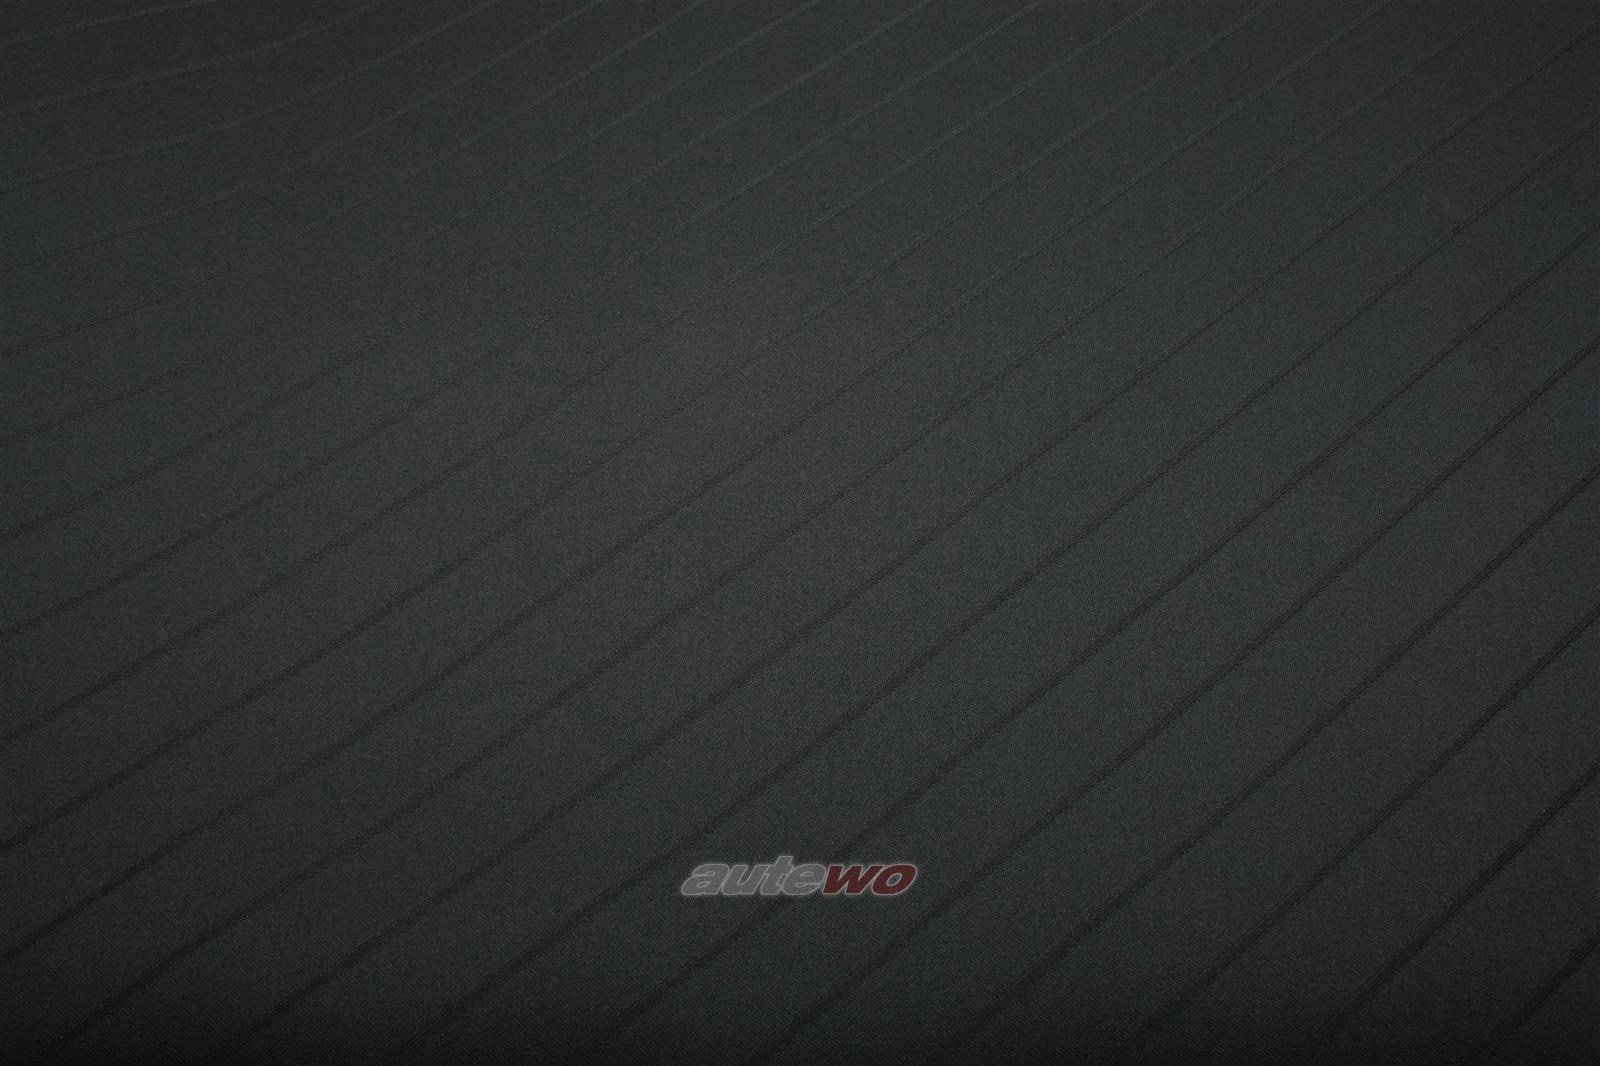 Audi 80/90/S2/Cabrio/Coupe 89/B4/100/200 44/C4 Jacquard Satin Stoff Diagonalstre